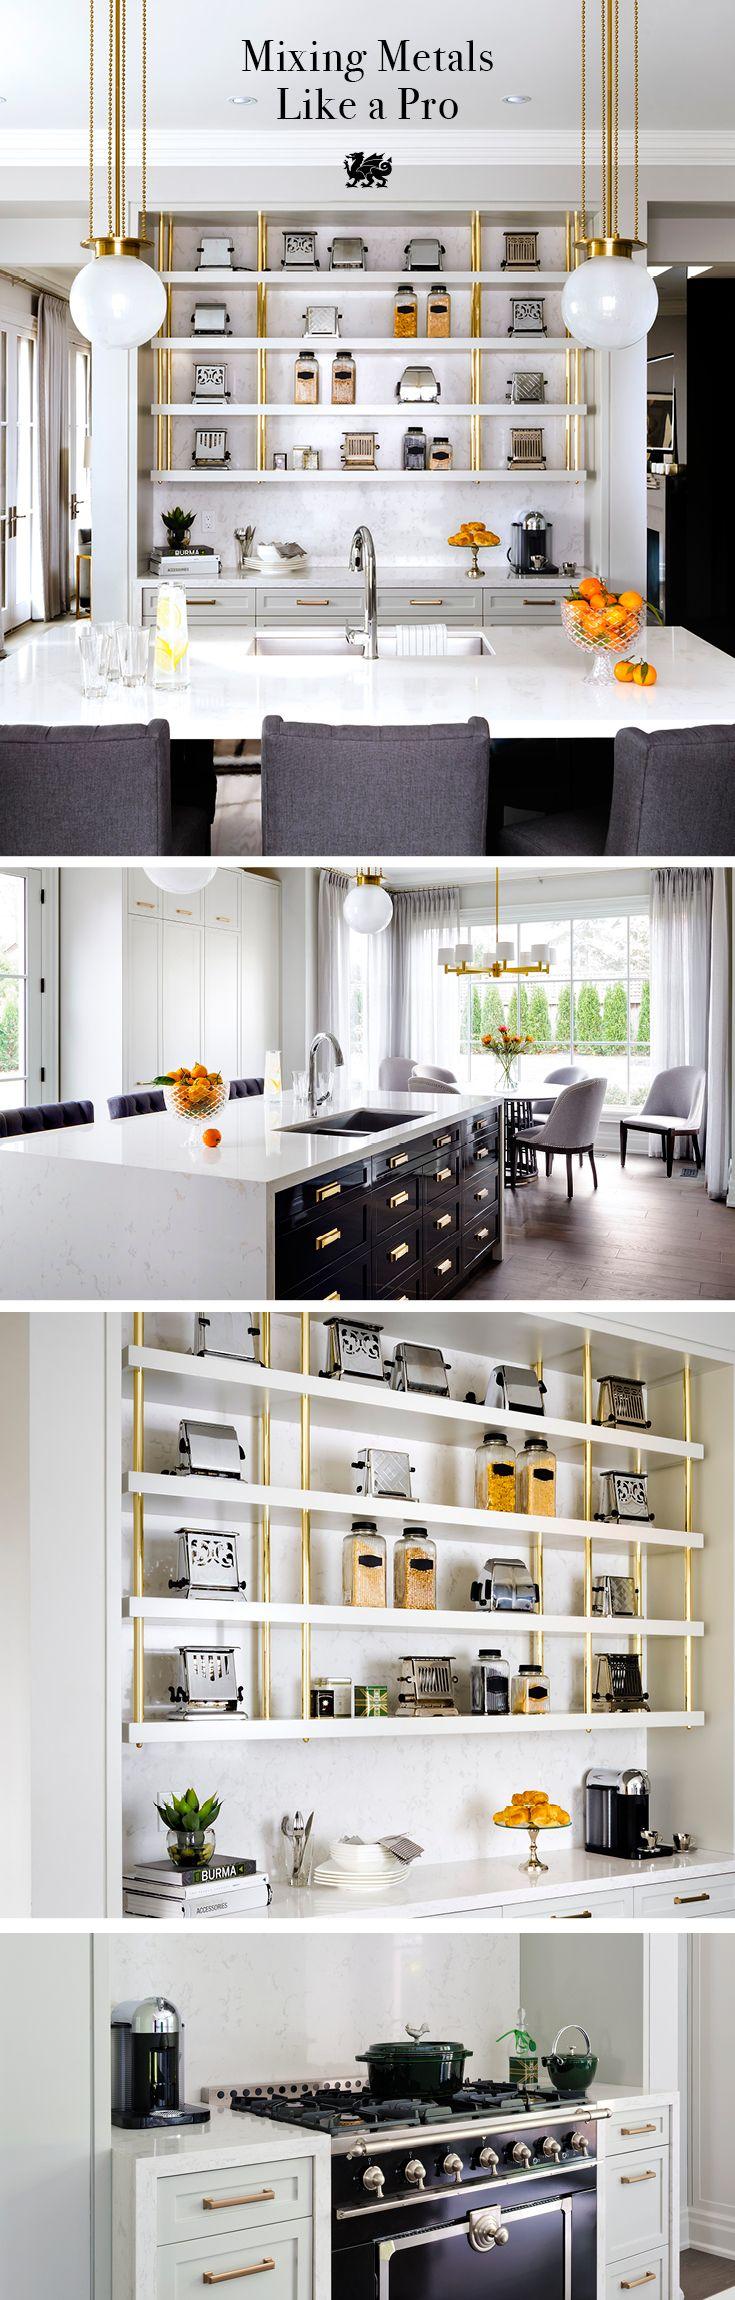 best decor kitchen images on pinterest